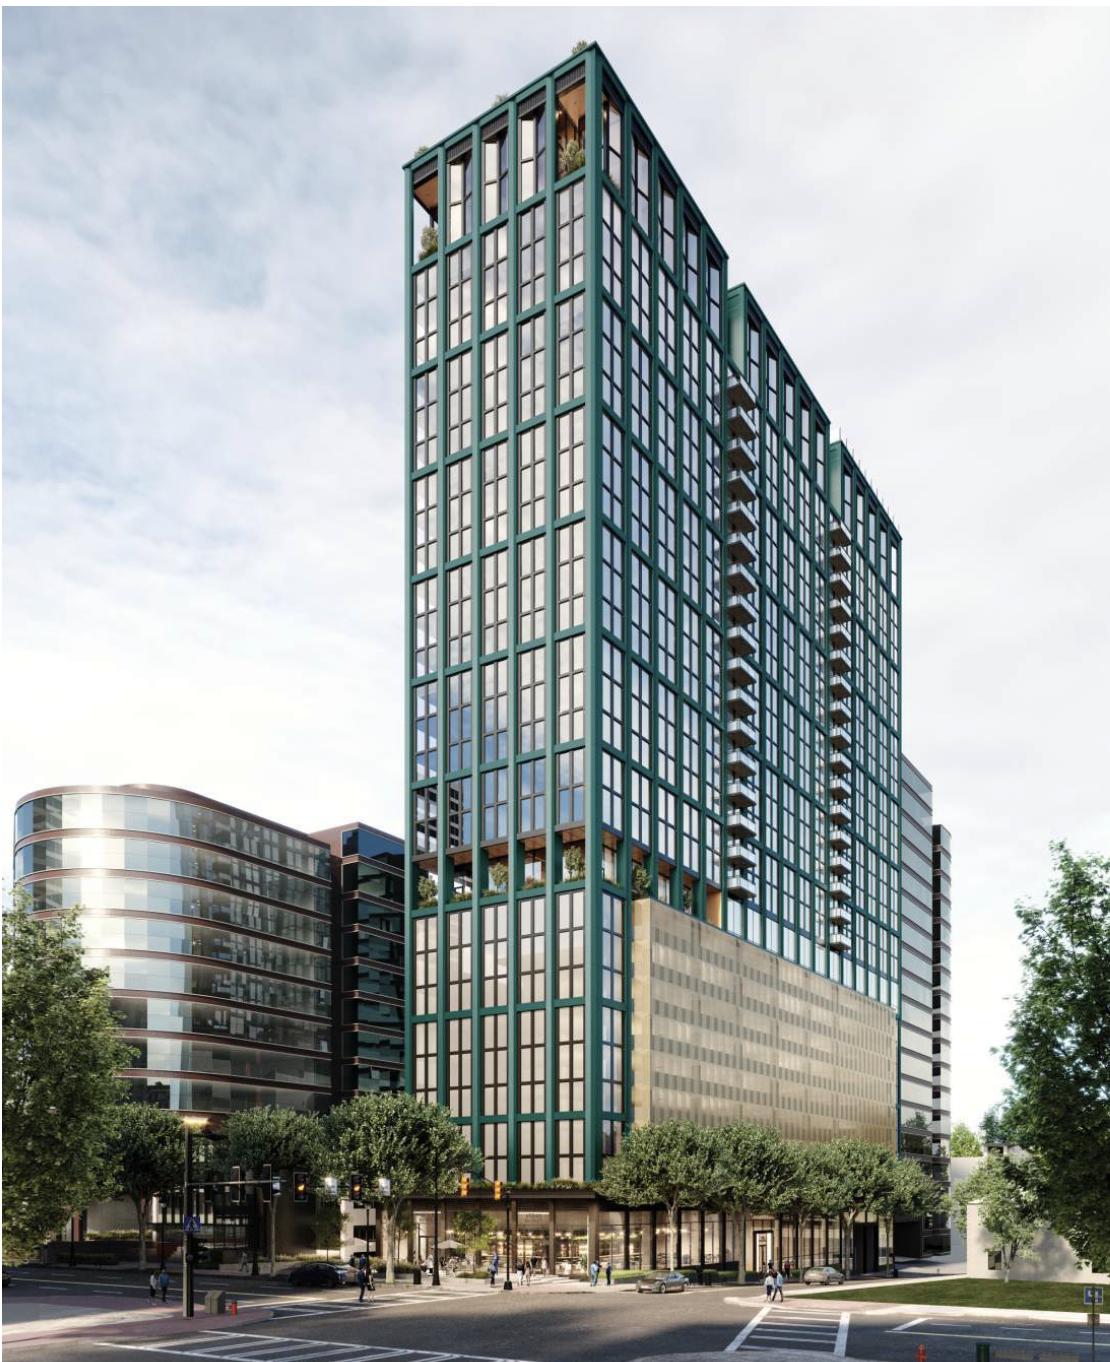 A rendering of the modern 34-floor building.